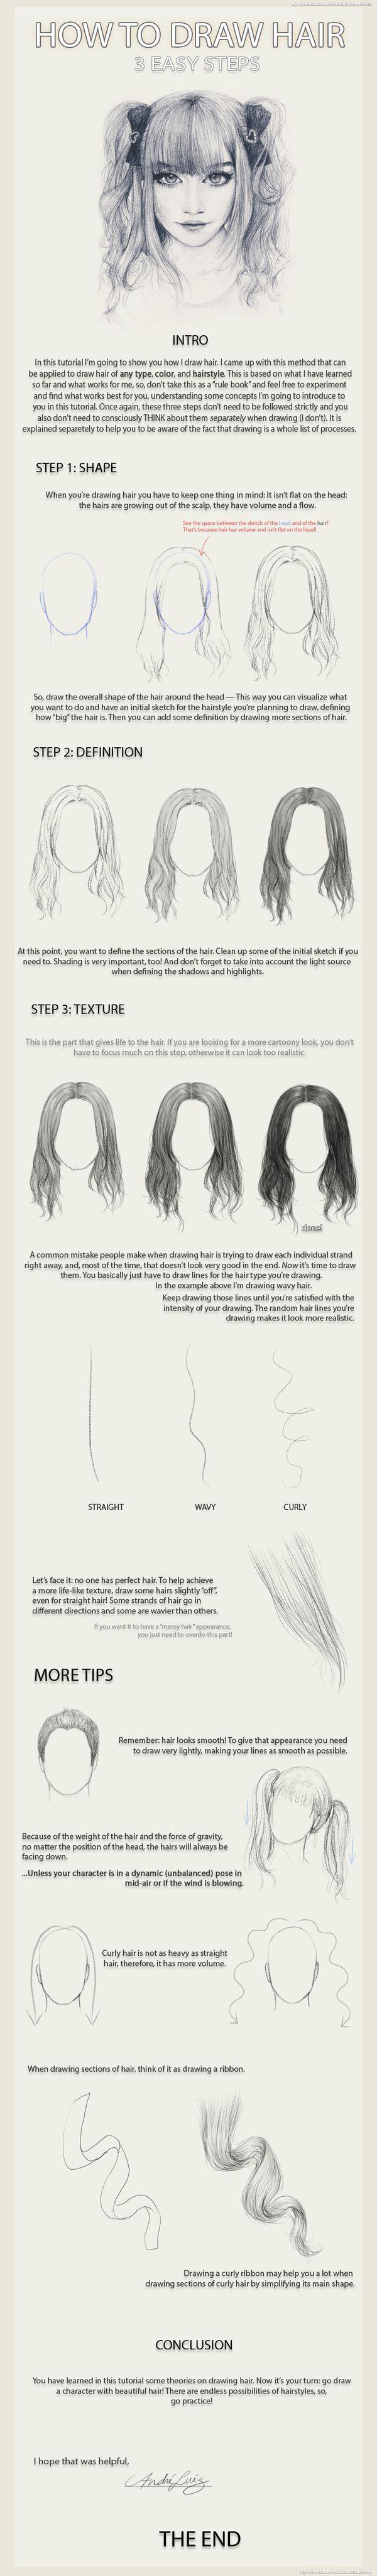 13 best hair colours images on Pinterest